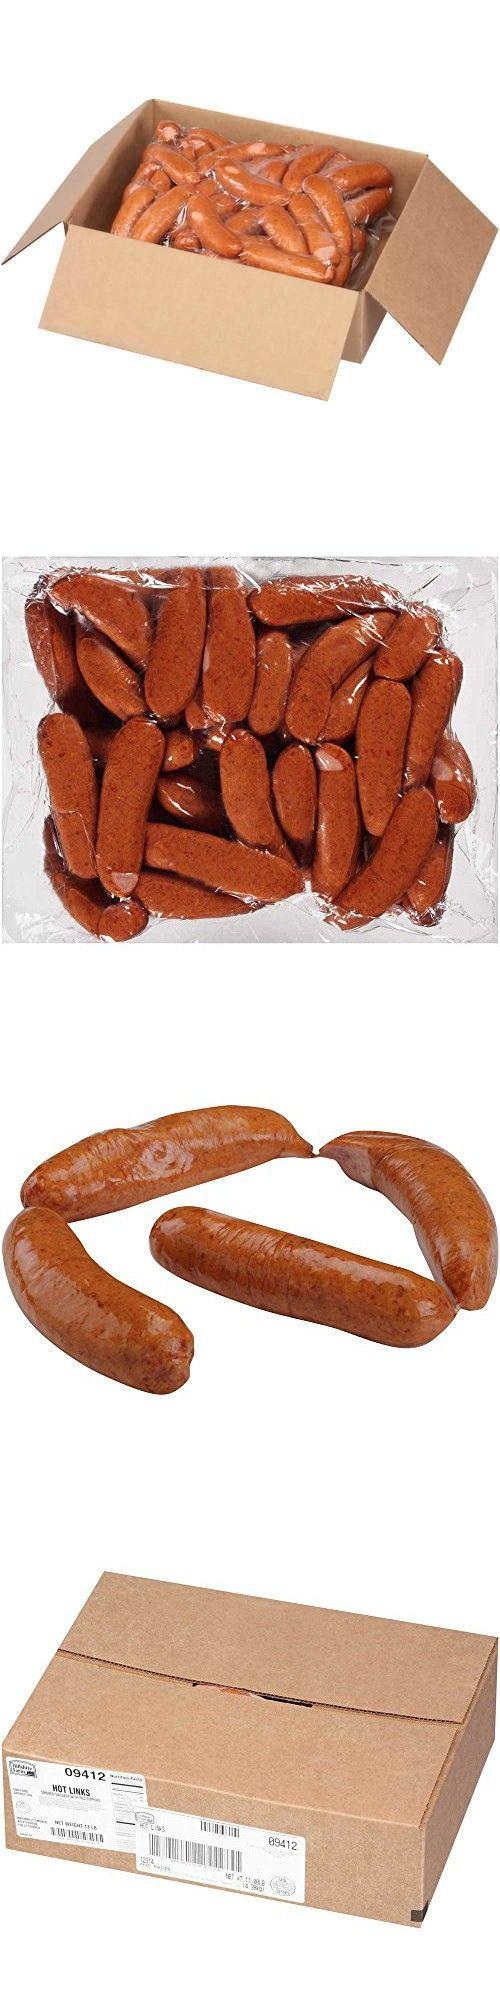 5-6:1 Hillshire Farms Hot Smoked Sausage Links, 11 Pound -- 1 each.